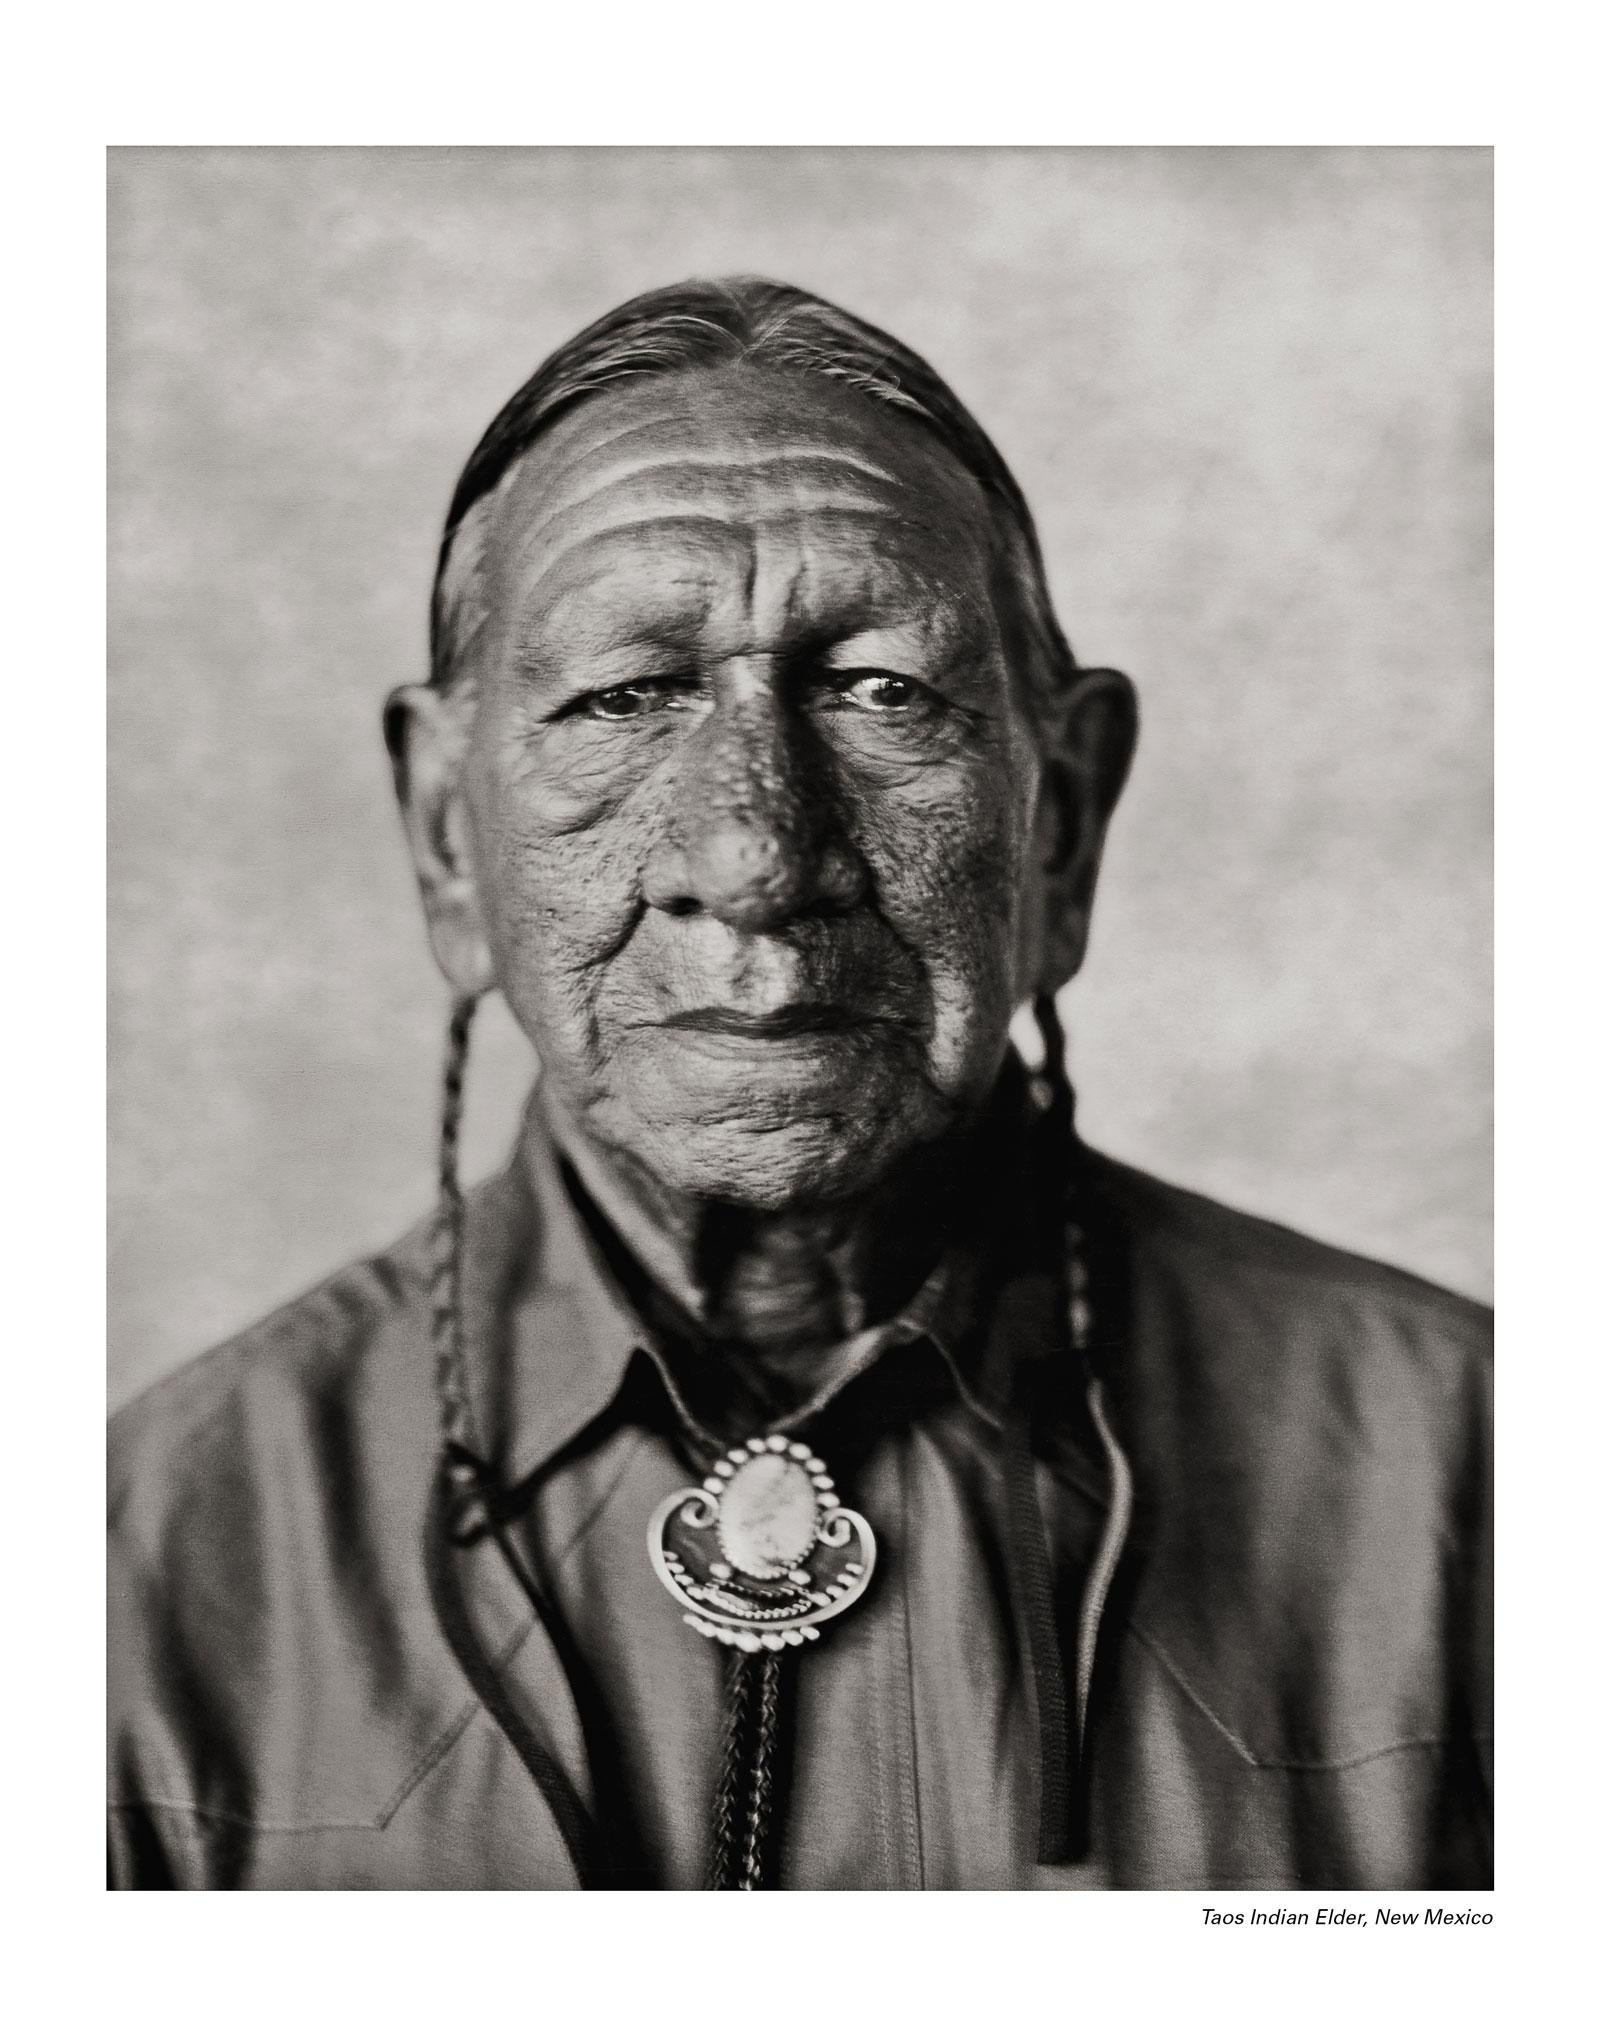 nf_Taos_Indian_Elder_New_Mexico.jpg